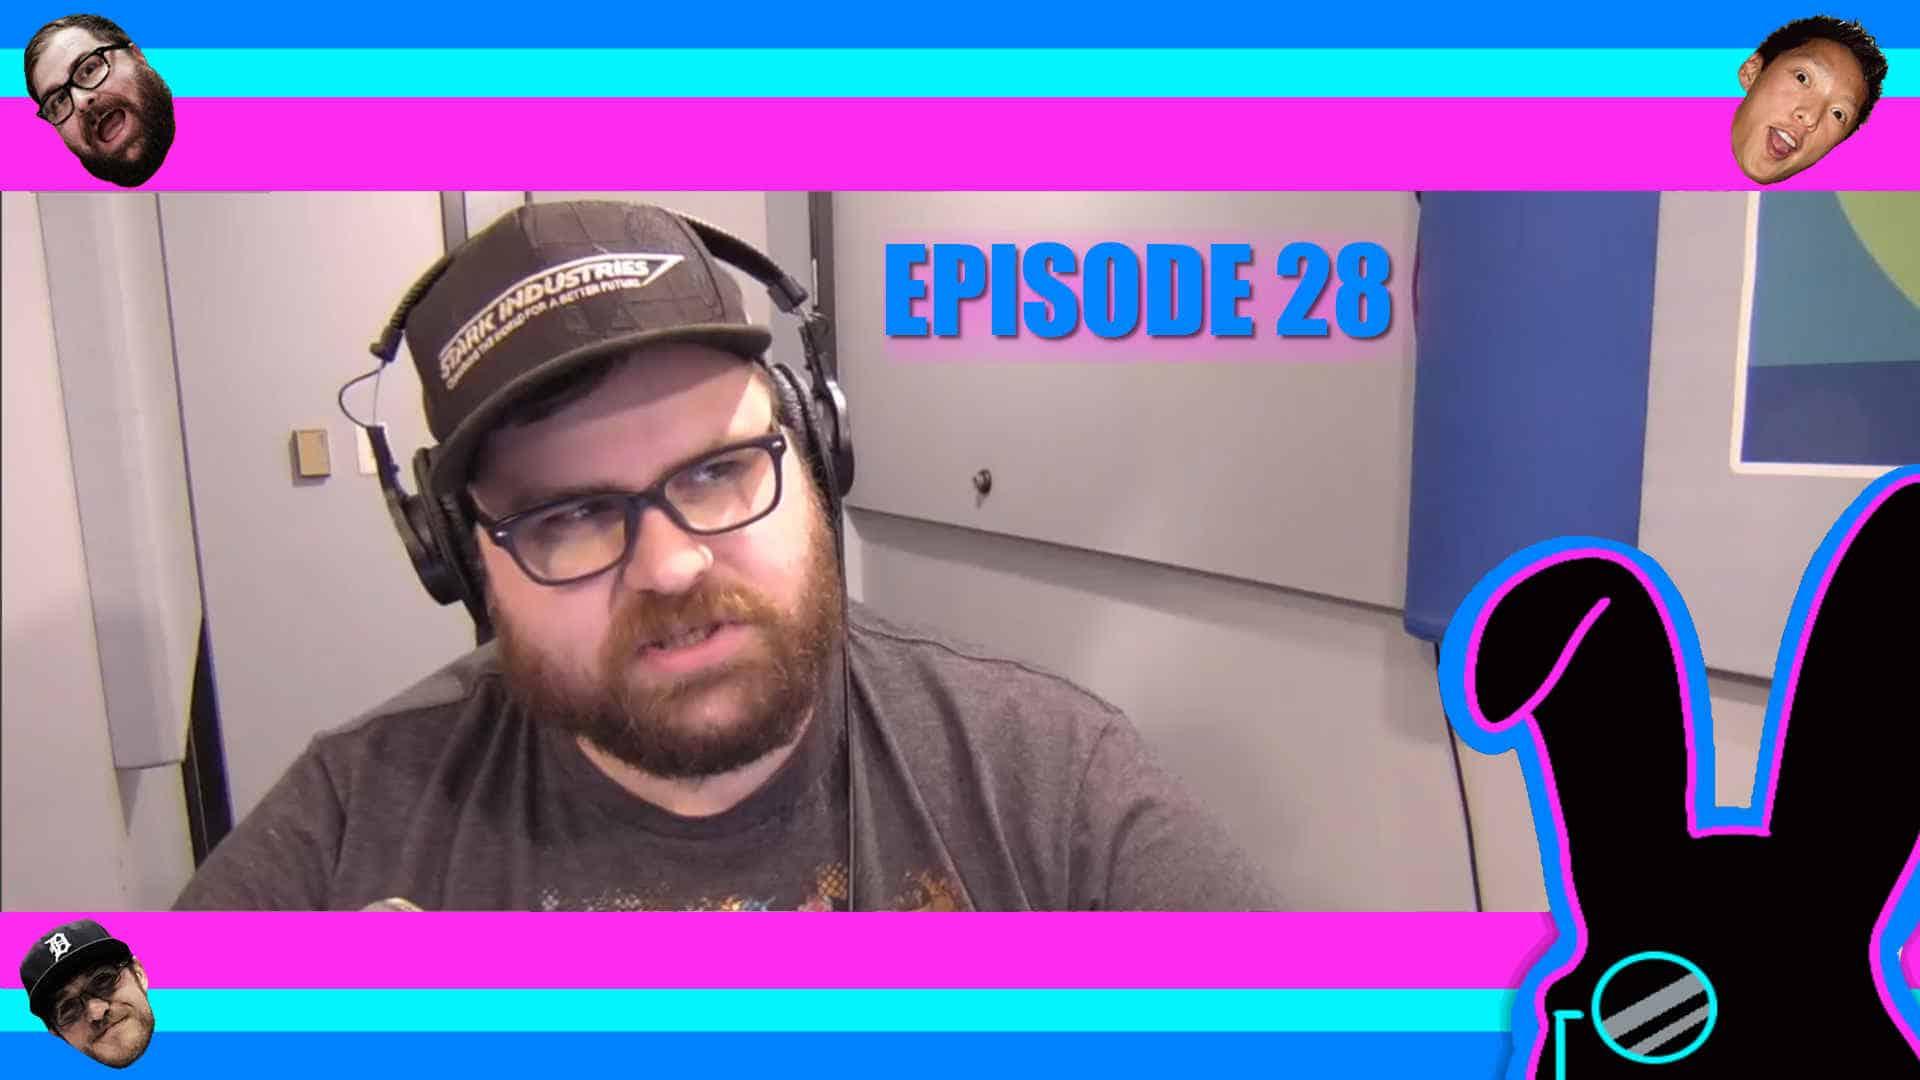 Geektainment Weekly - Episode 28